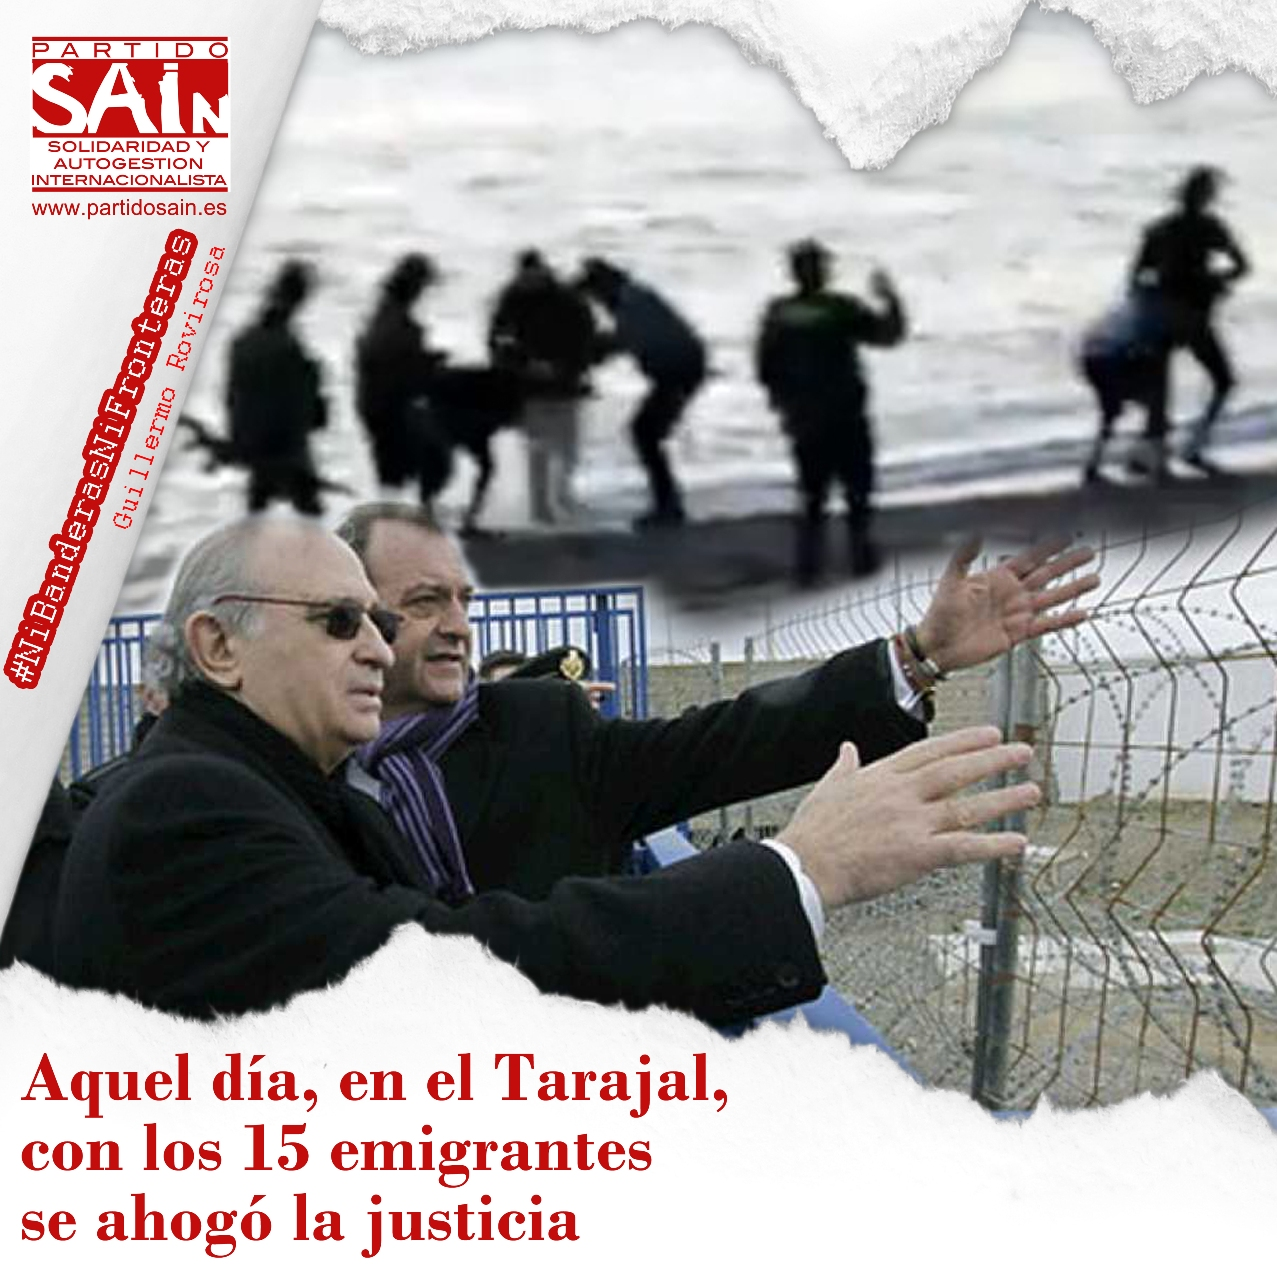 Las fronteras matan